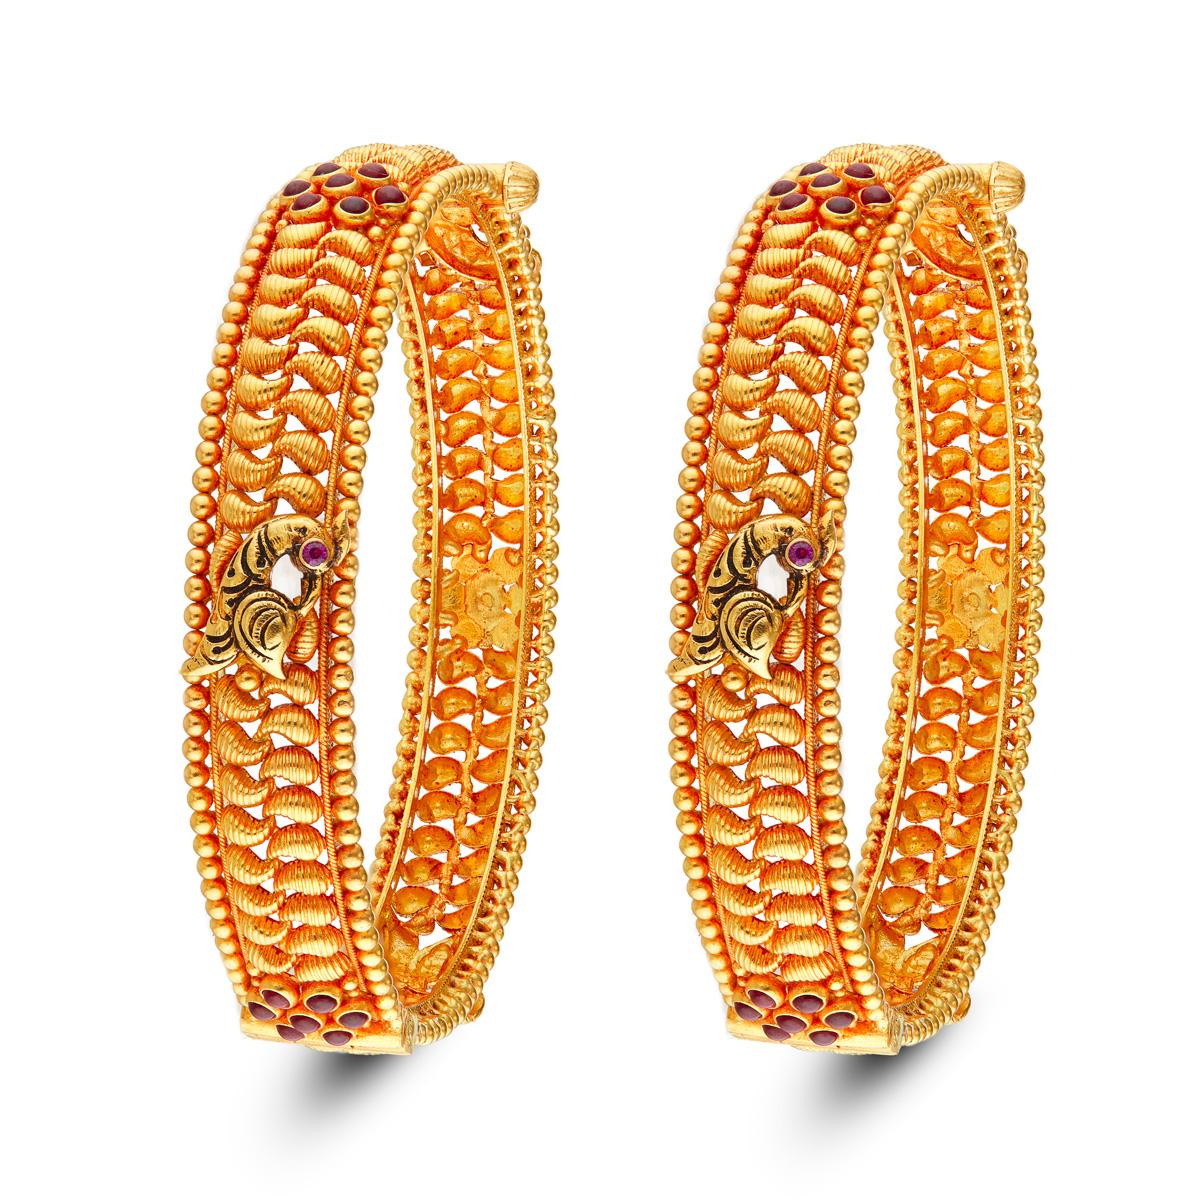 Fancy Gold bangles!